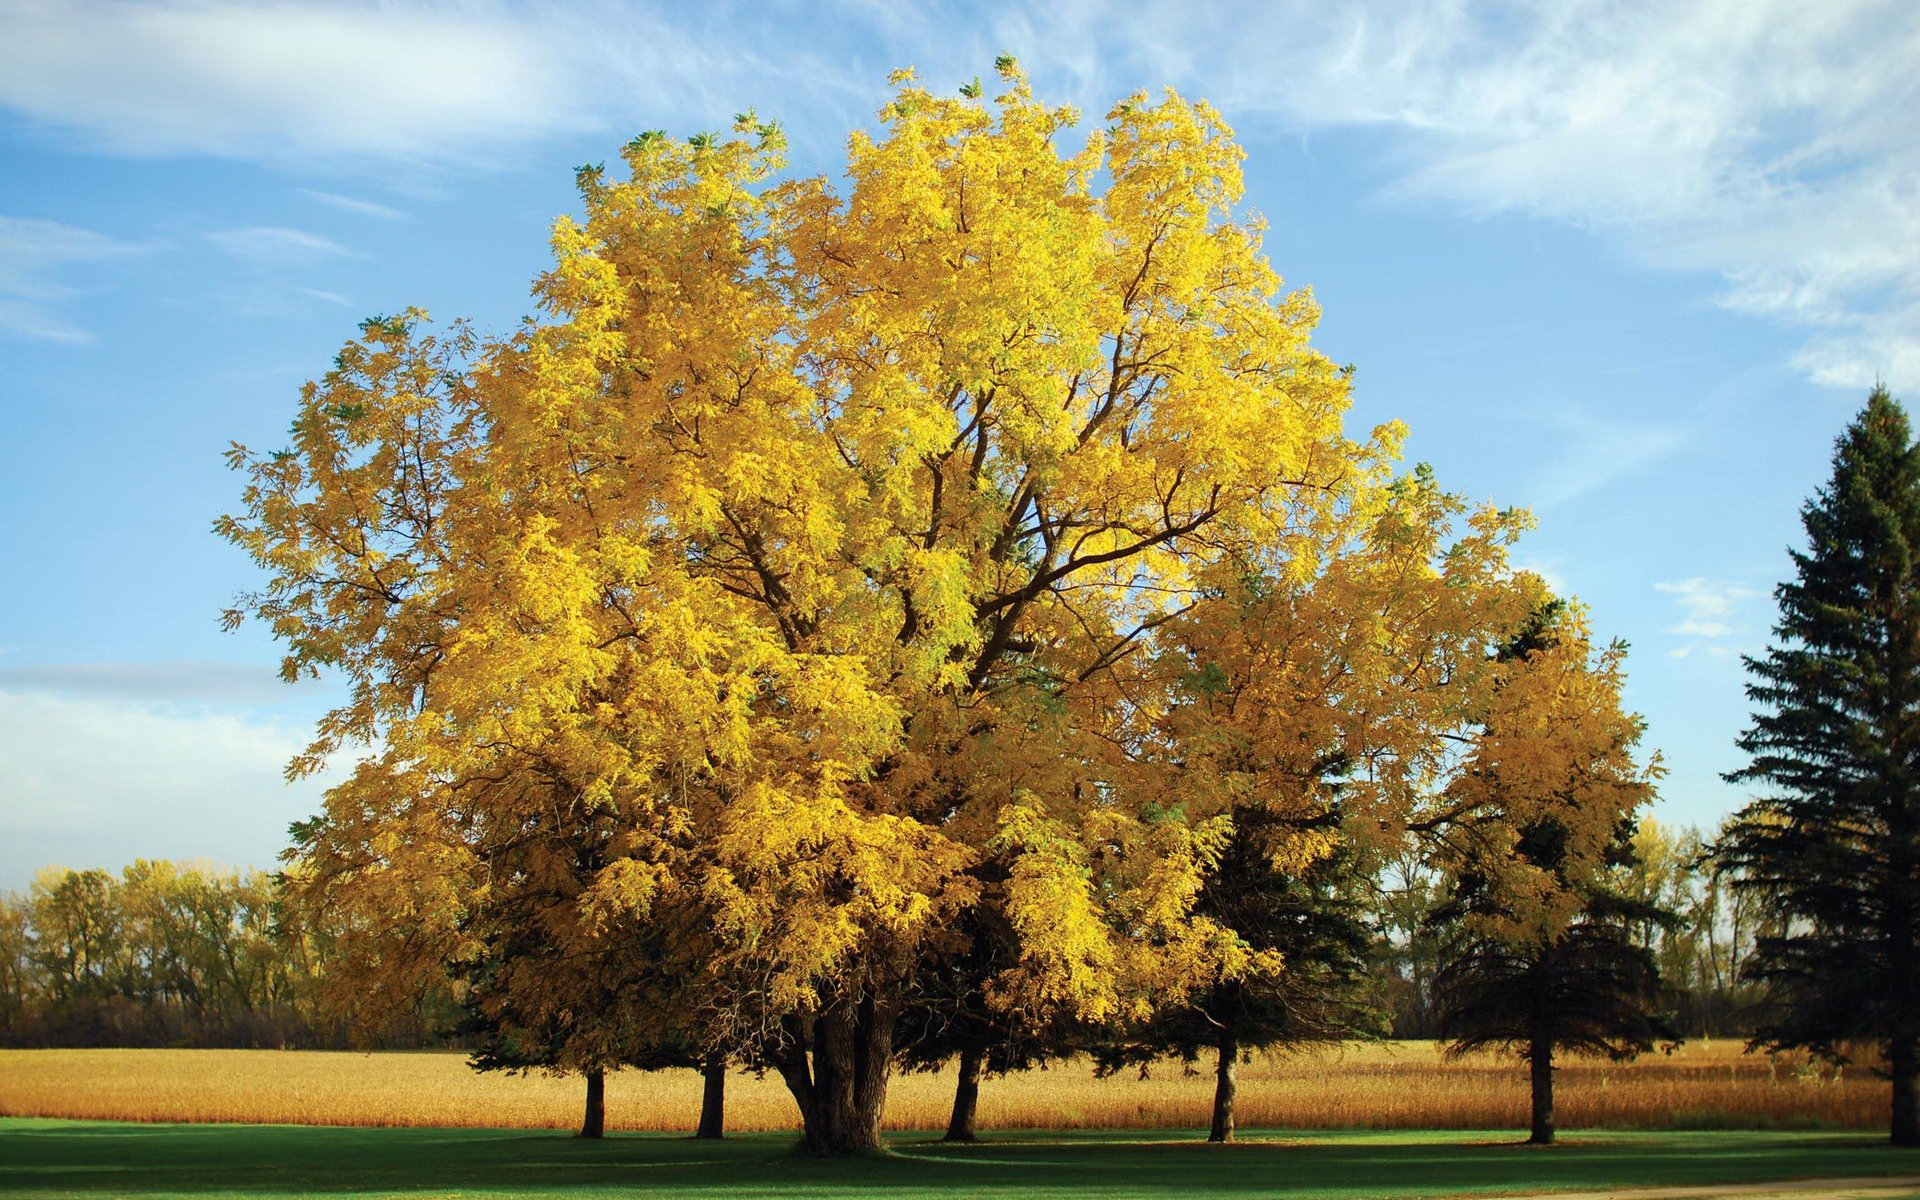 http://khongthe.com/wallpapers/nature/yellow-oak-tree-65423.jpg